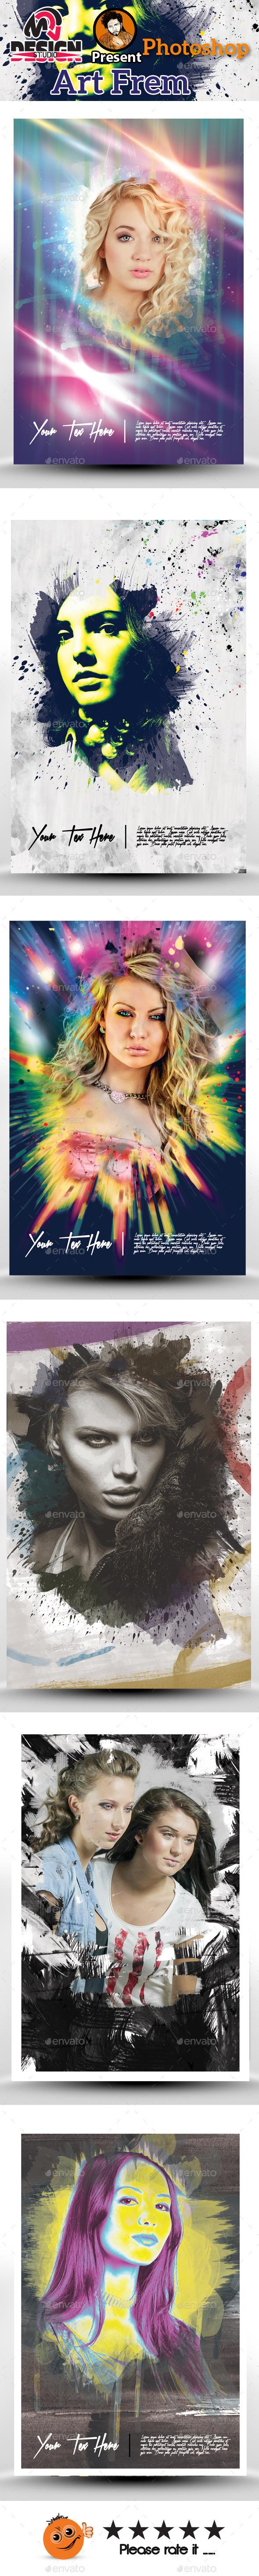 Art Frem - Photo Templates Graphics